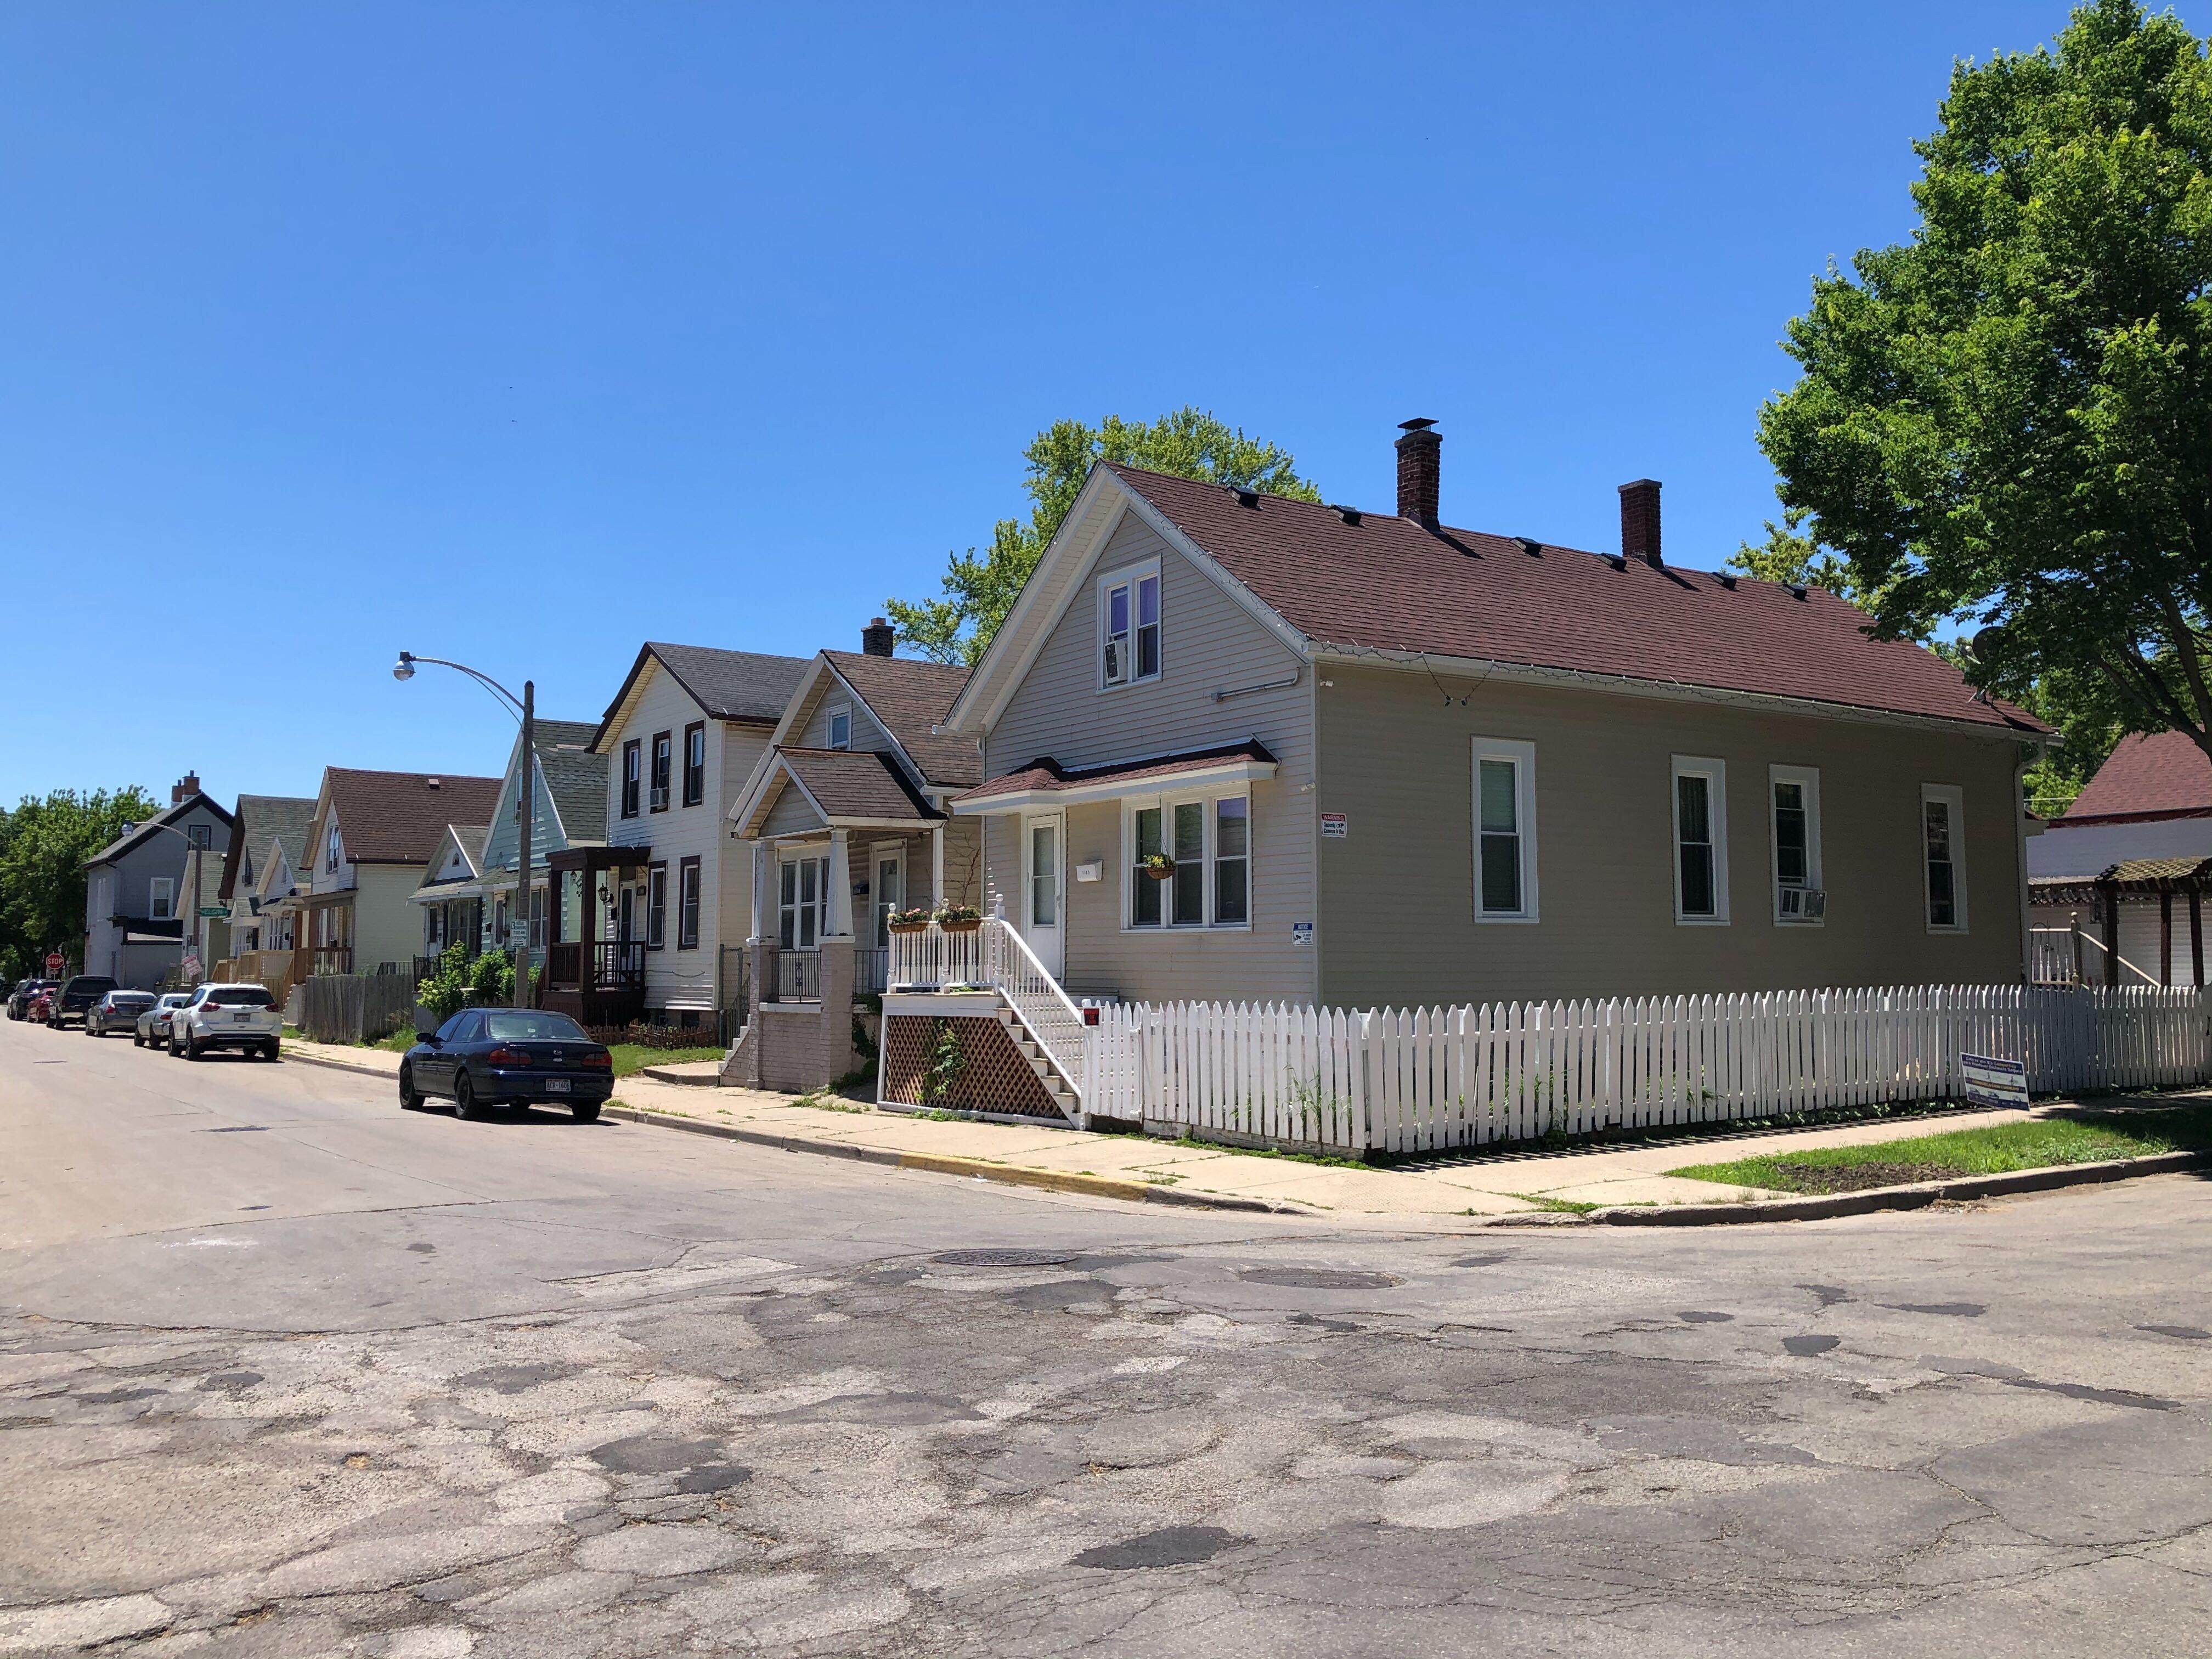 Homes on S. 15th St. Photo by Jeramey Jannene.